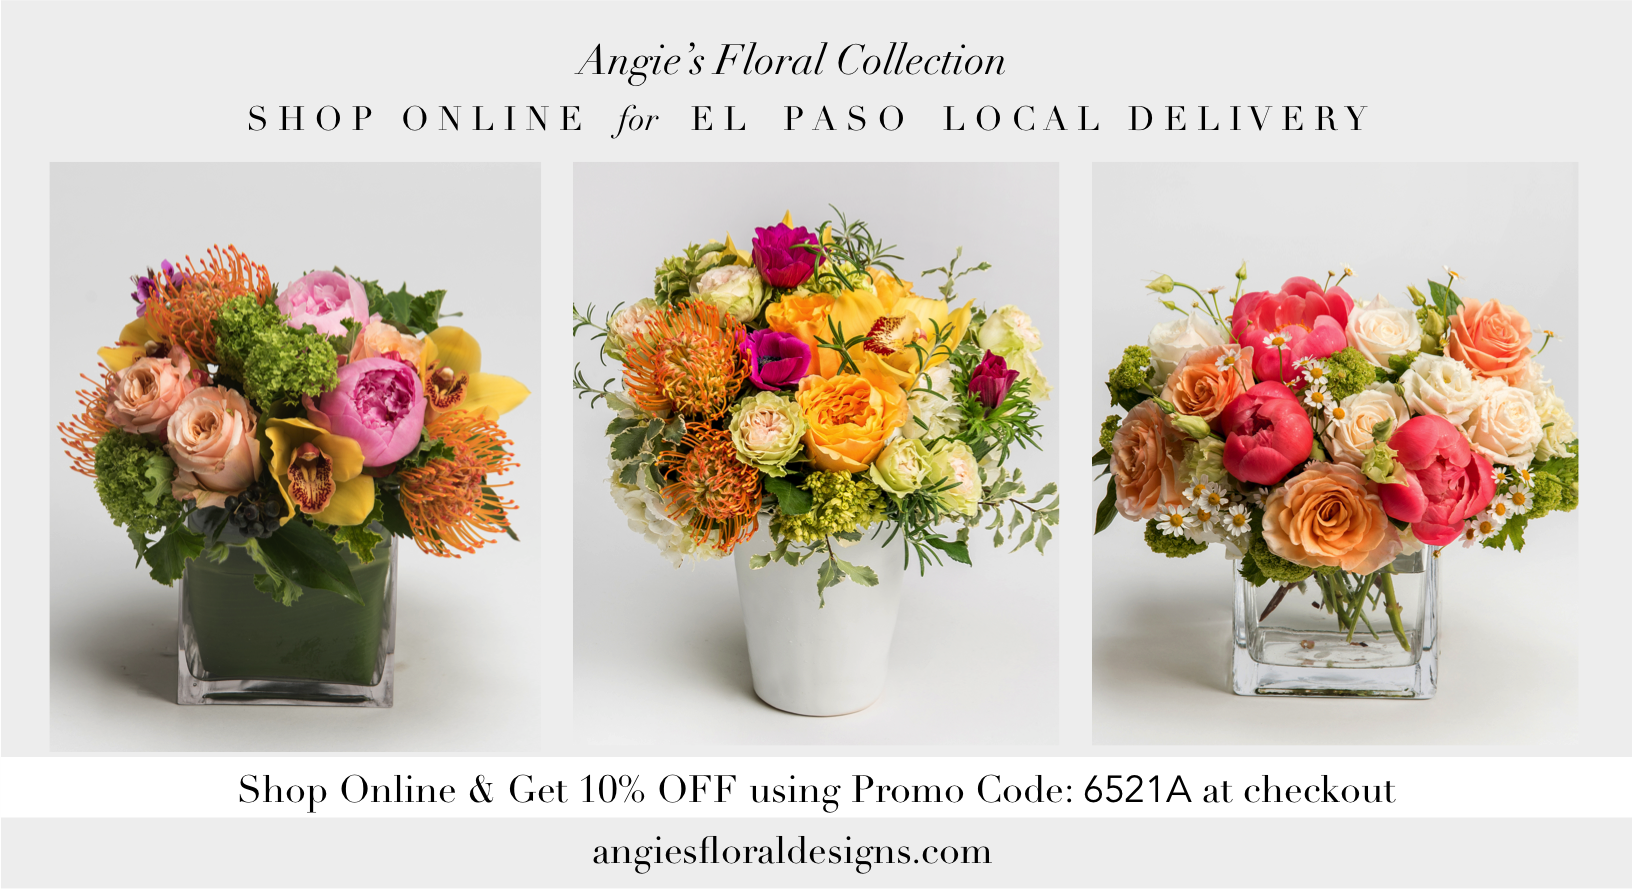 03-angies-floral-designs-el-paso-florist-el-paso-texas-fall-flowers-shop-online-el-paso-florist-floreria-floral-designs-.png